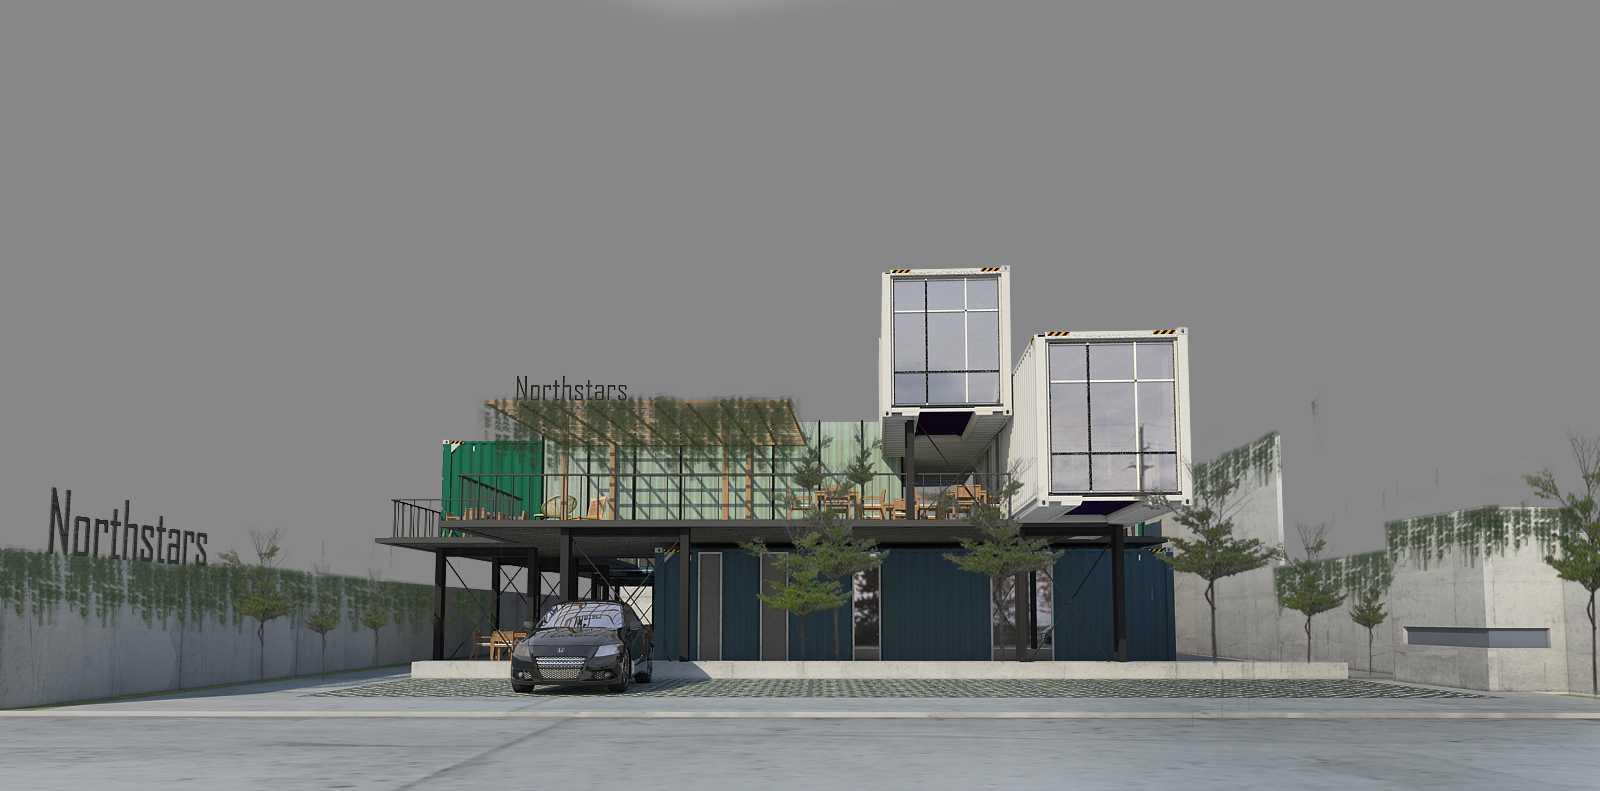 Braun Studio Northstars Cafe Medan Jl. Jamin Ginting, Padang Bulan, Medan Baru, Kota Medan, Sumatera Utara 20157, Indonesia Medan Sisingamangaraja Front View Industrial  25850